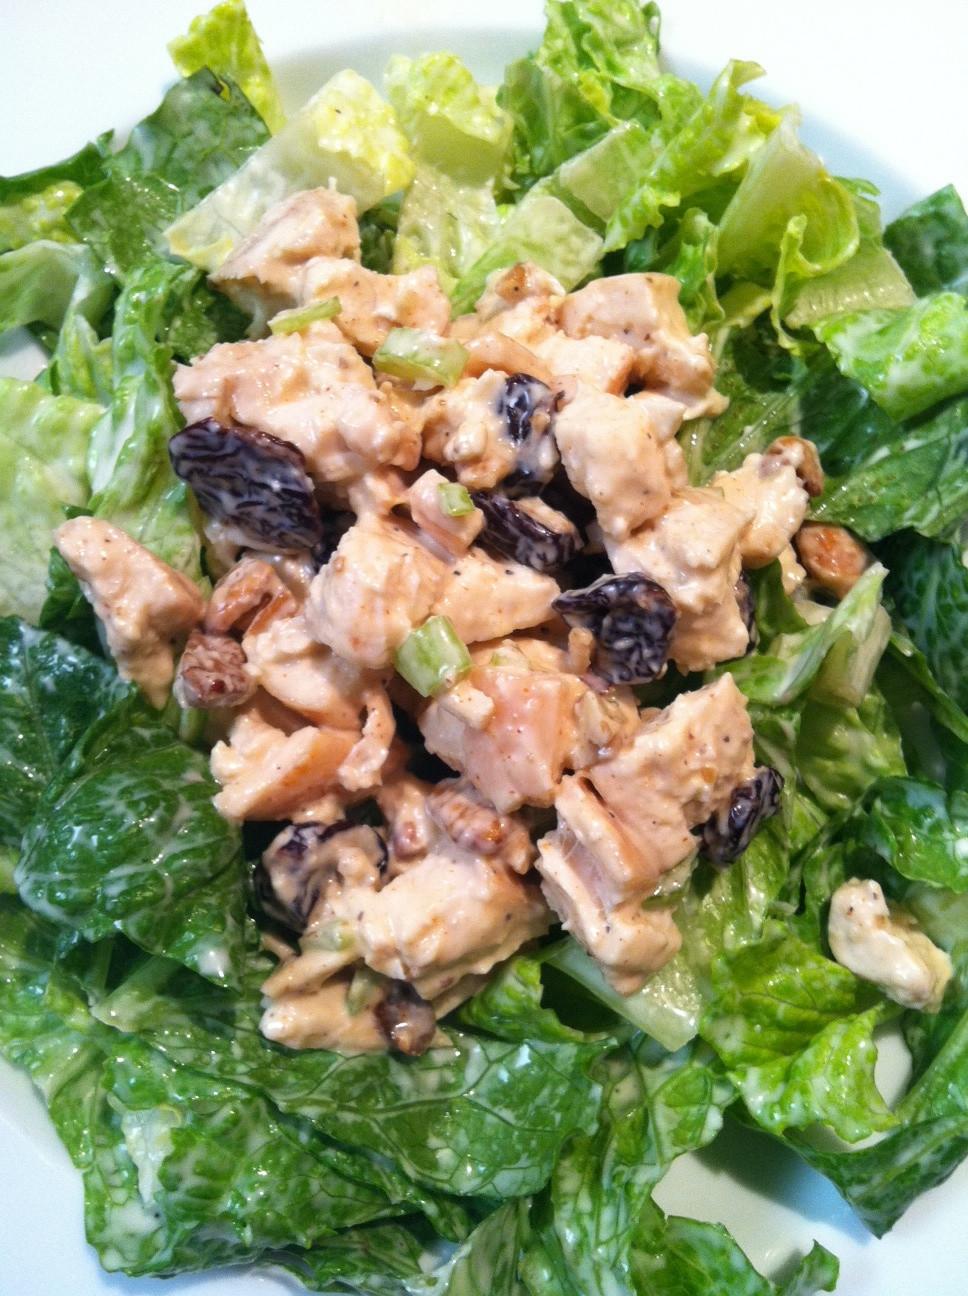 Sonoma Chicken Salad  sonoma chicken salad